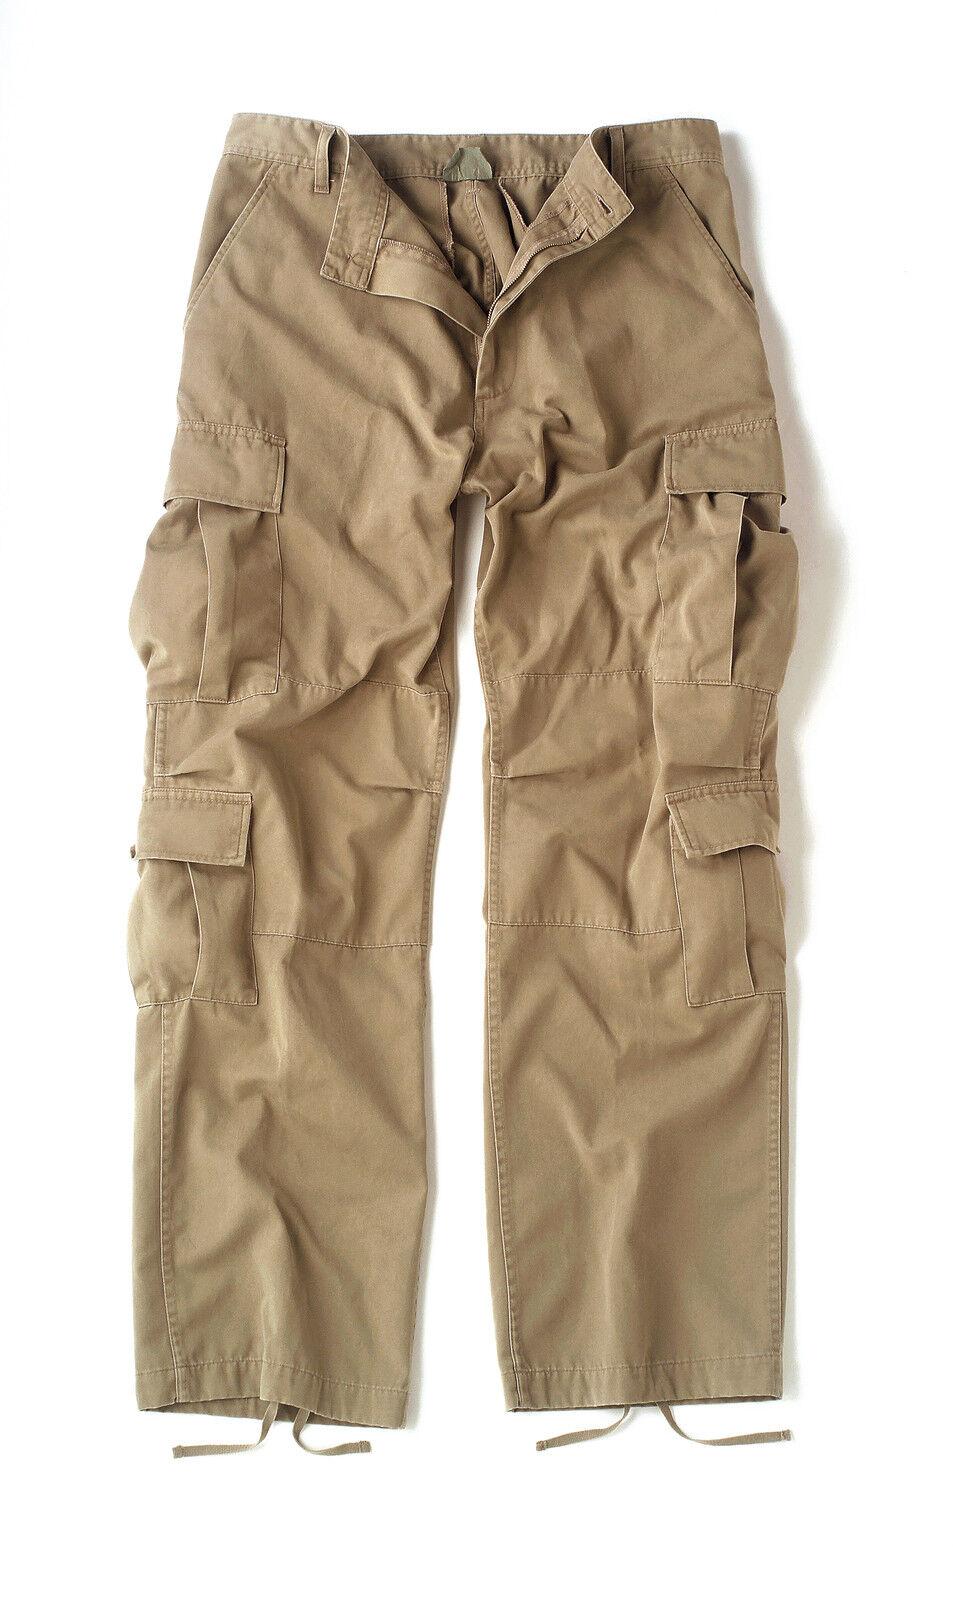 Vintage Khaki Paratrooper Cargo Pants BDU XS-3XL